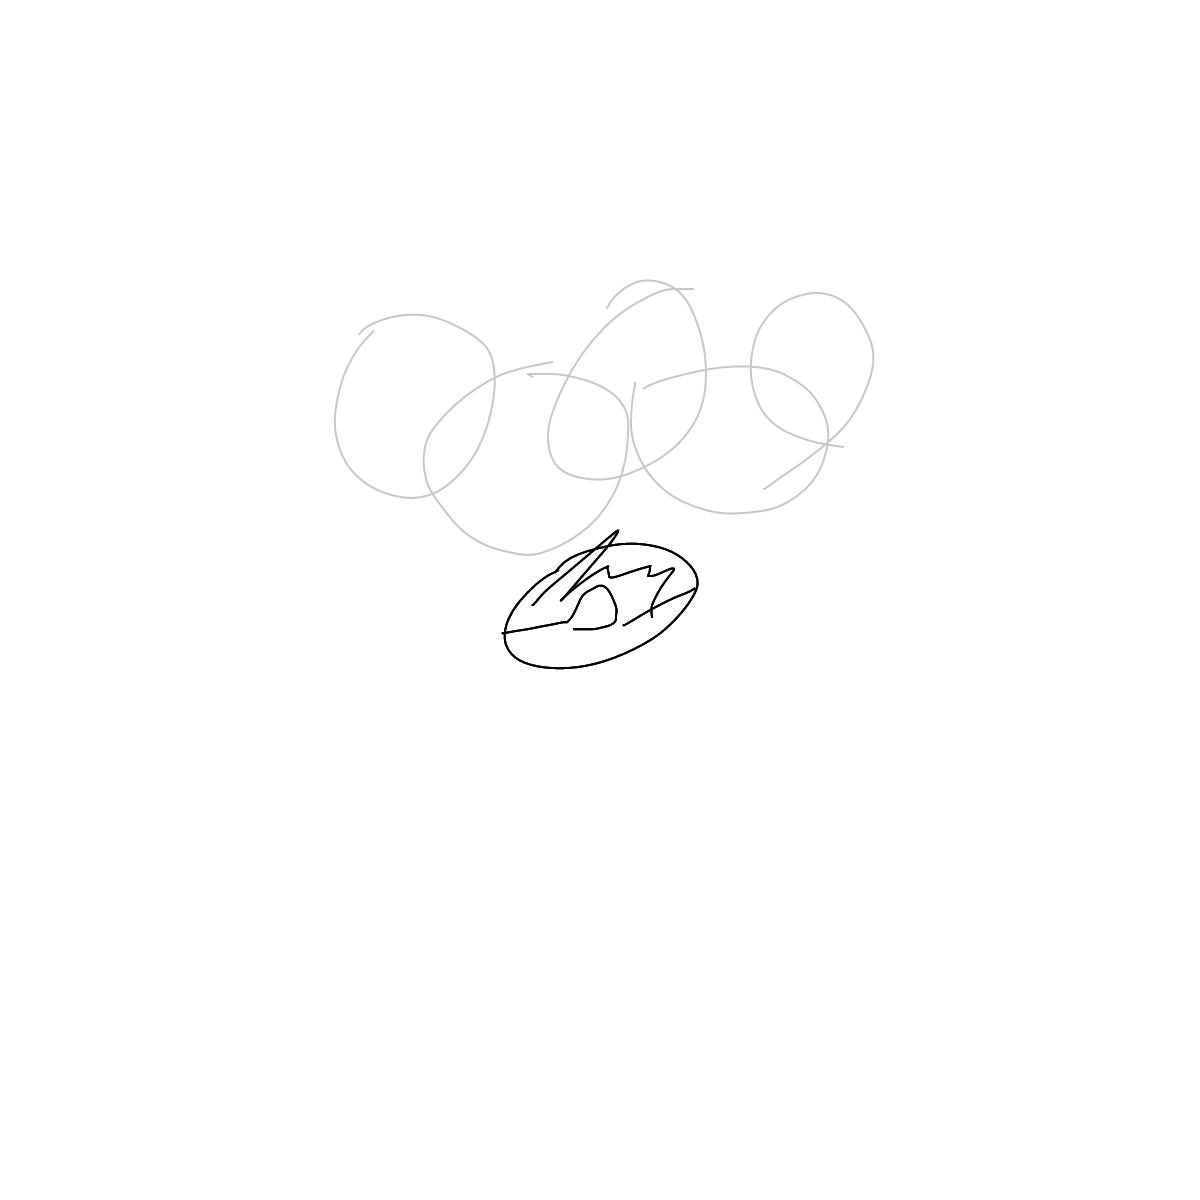 BAAAM drawing#22362 lat:-22.9110202789306640lng: -43.2093811035156250